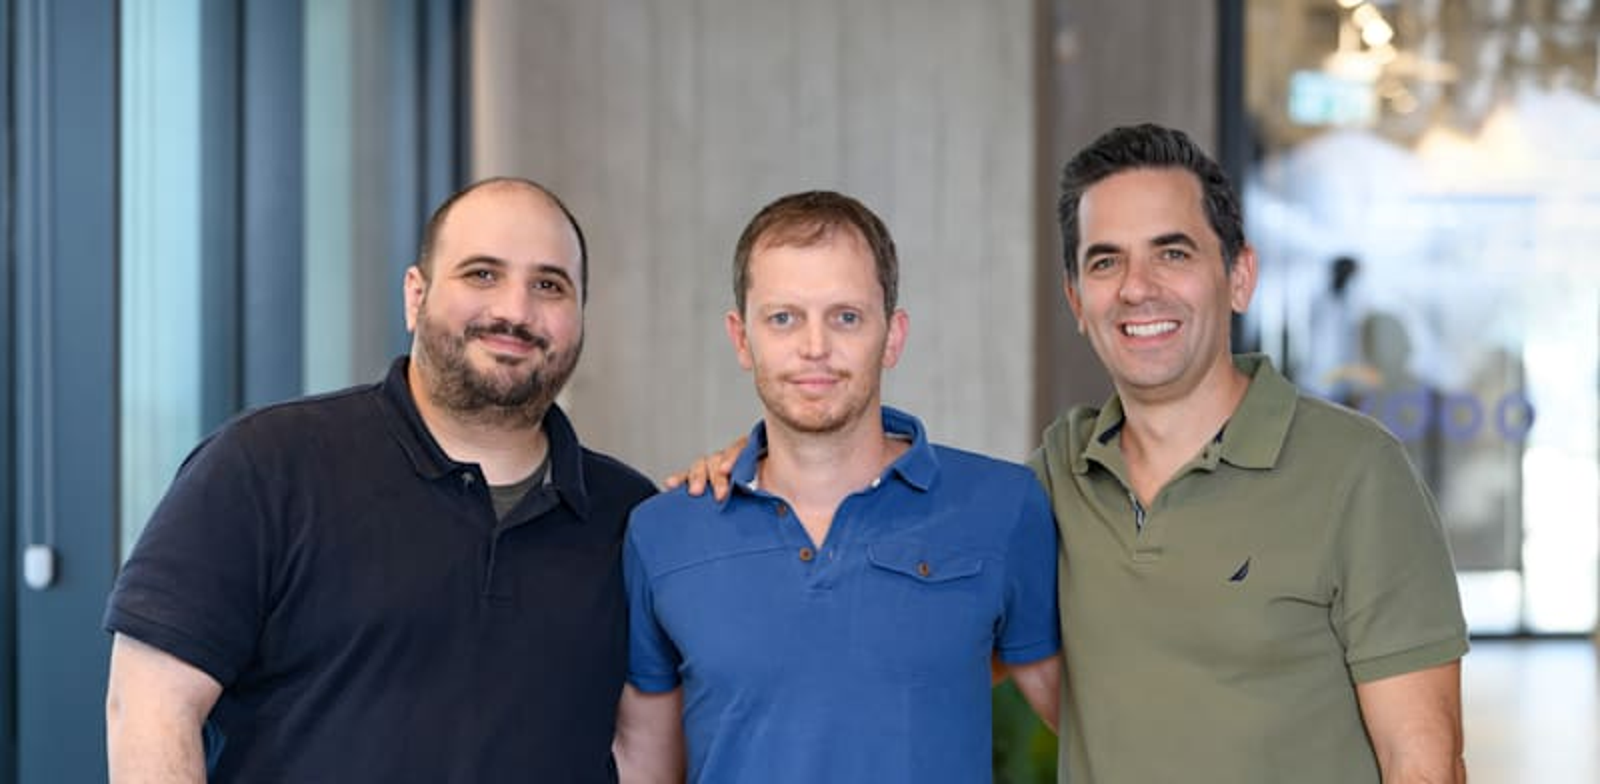 Vdoo founders. Credit: PR